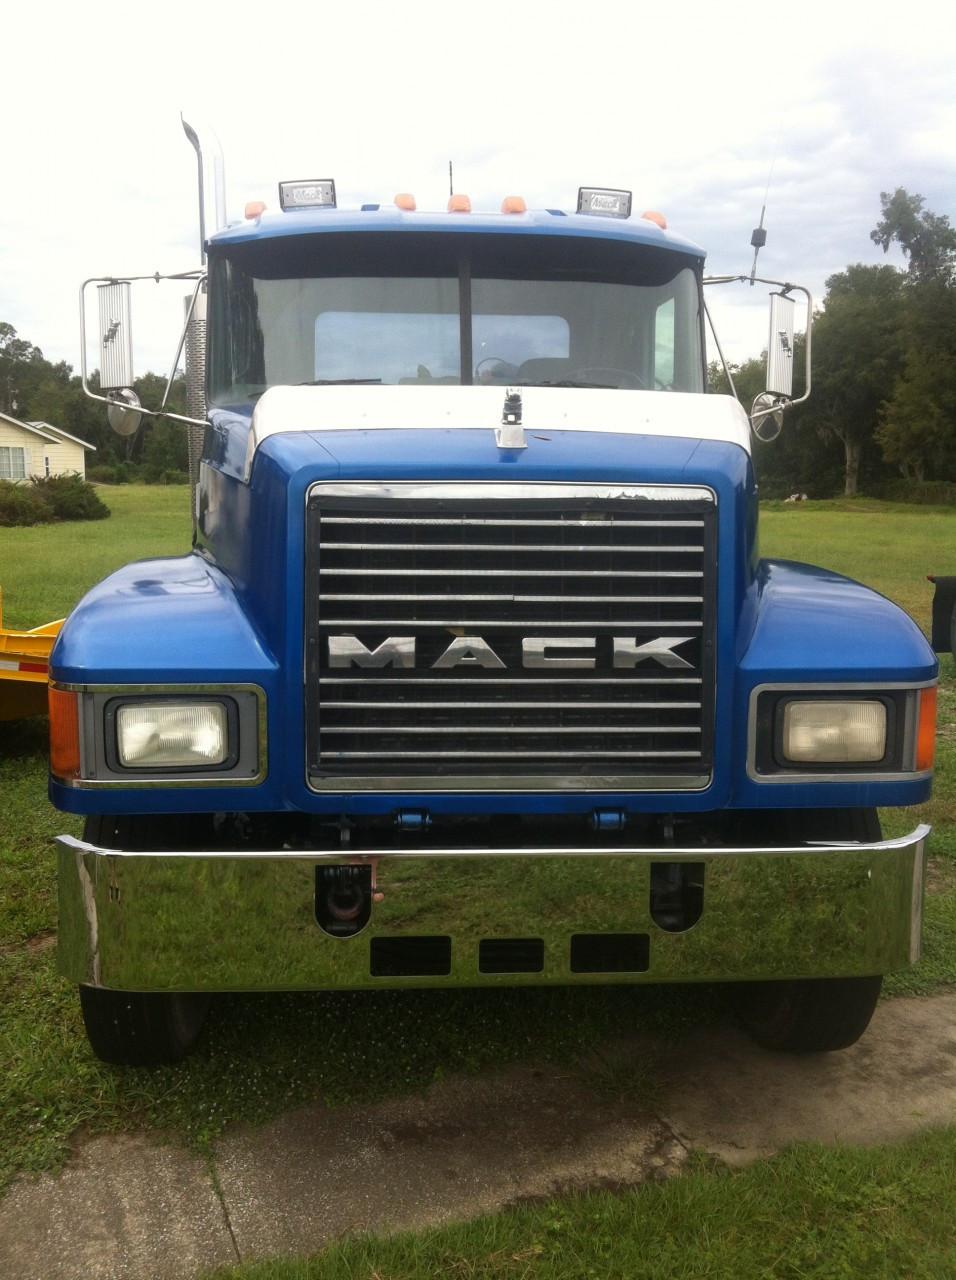 Mack Ct713 Truck Wiring Opinions About Diagram Dump Trailer Schematics Diagrams U2022 Rh Sierrahullfestival Com Granite Air Conditioner Problems